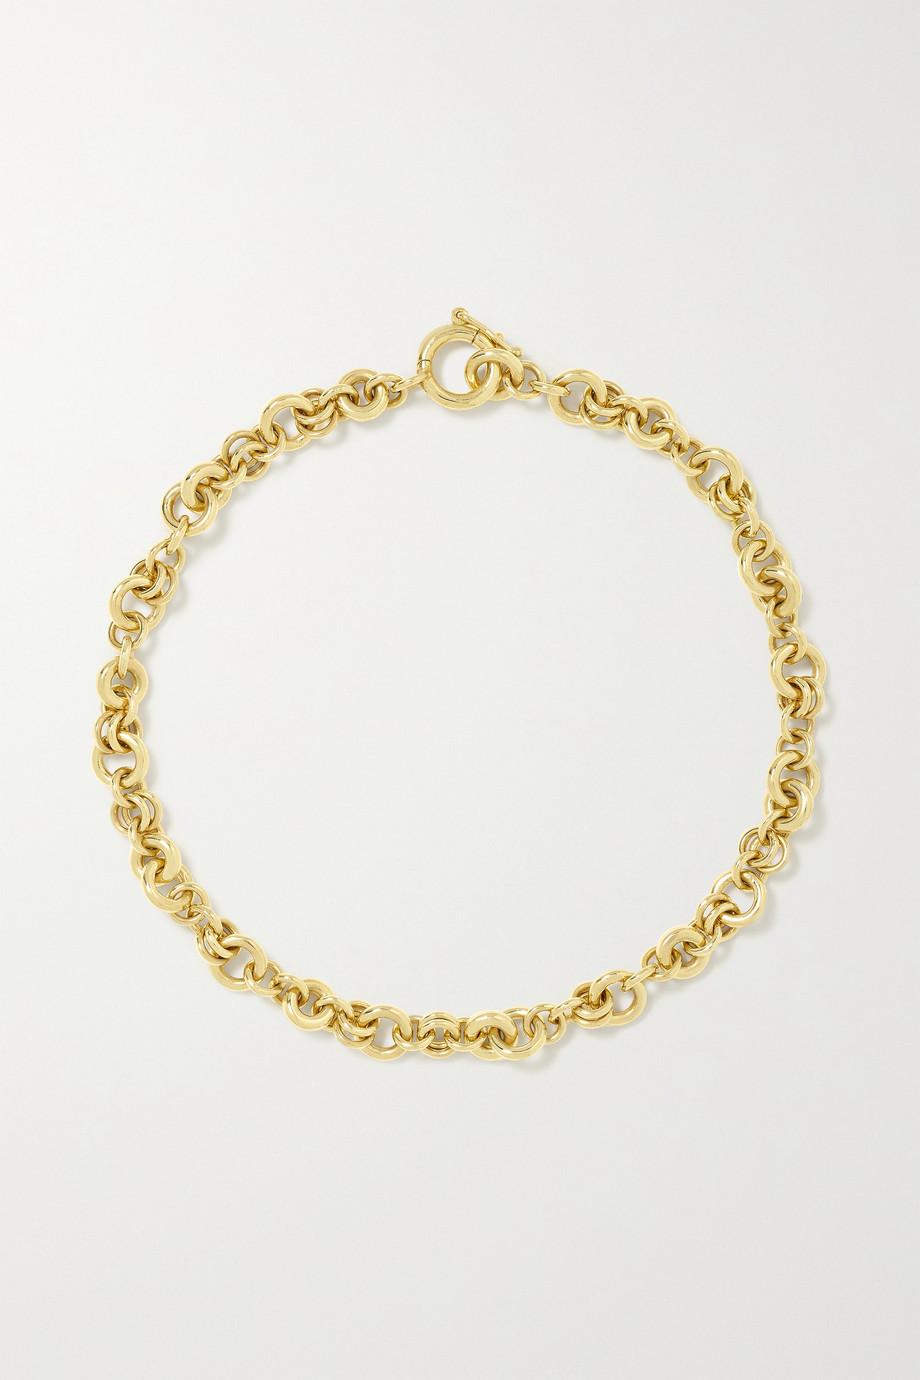 Spinelli Kilcollin Helio Armband aus 18 Karat Gold